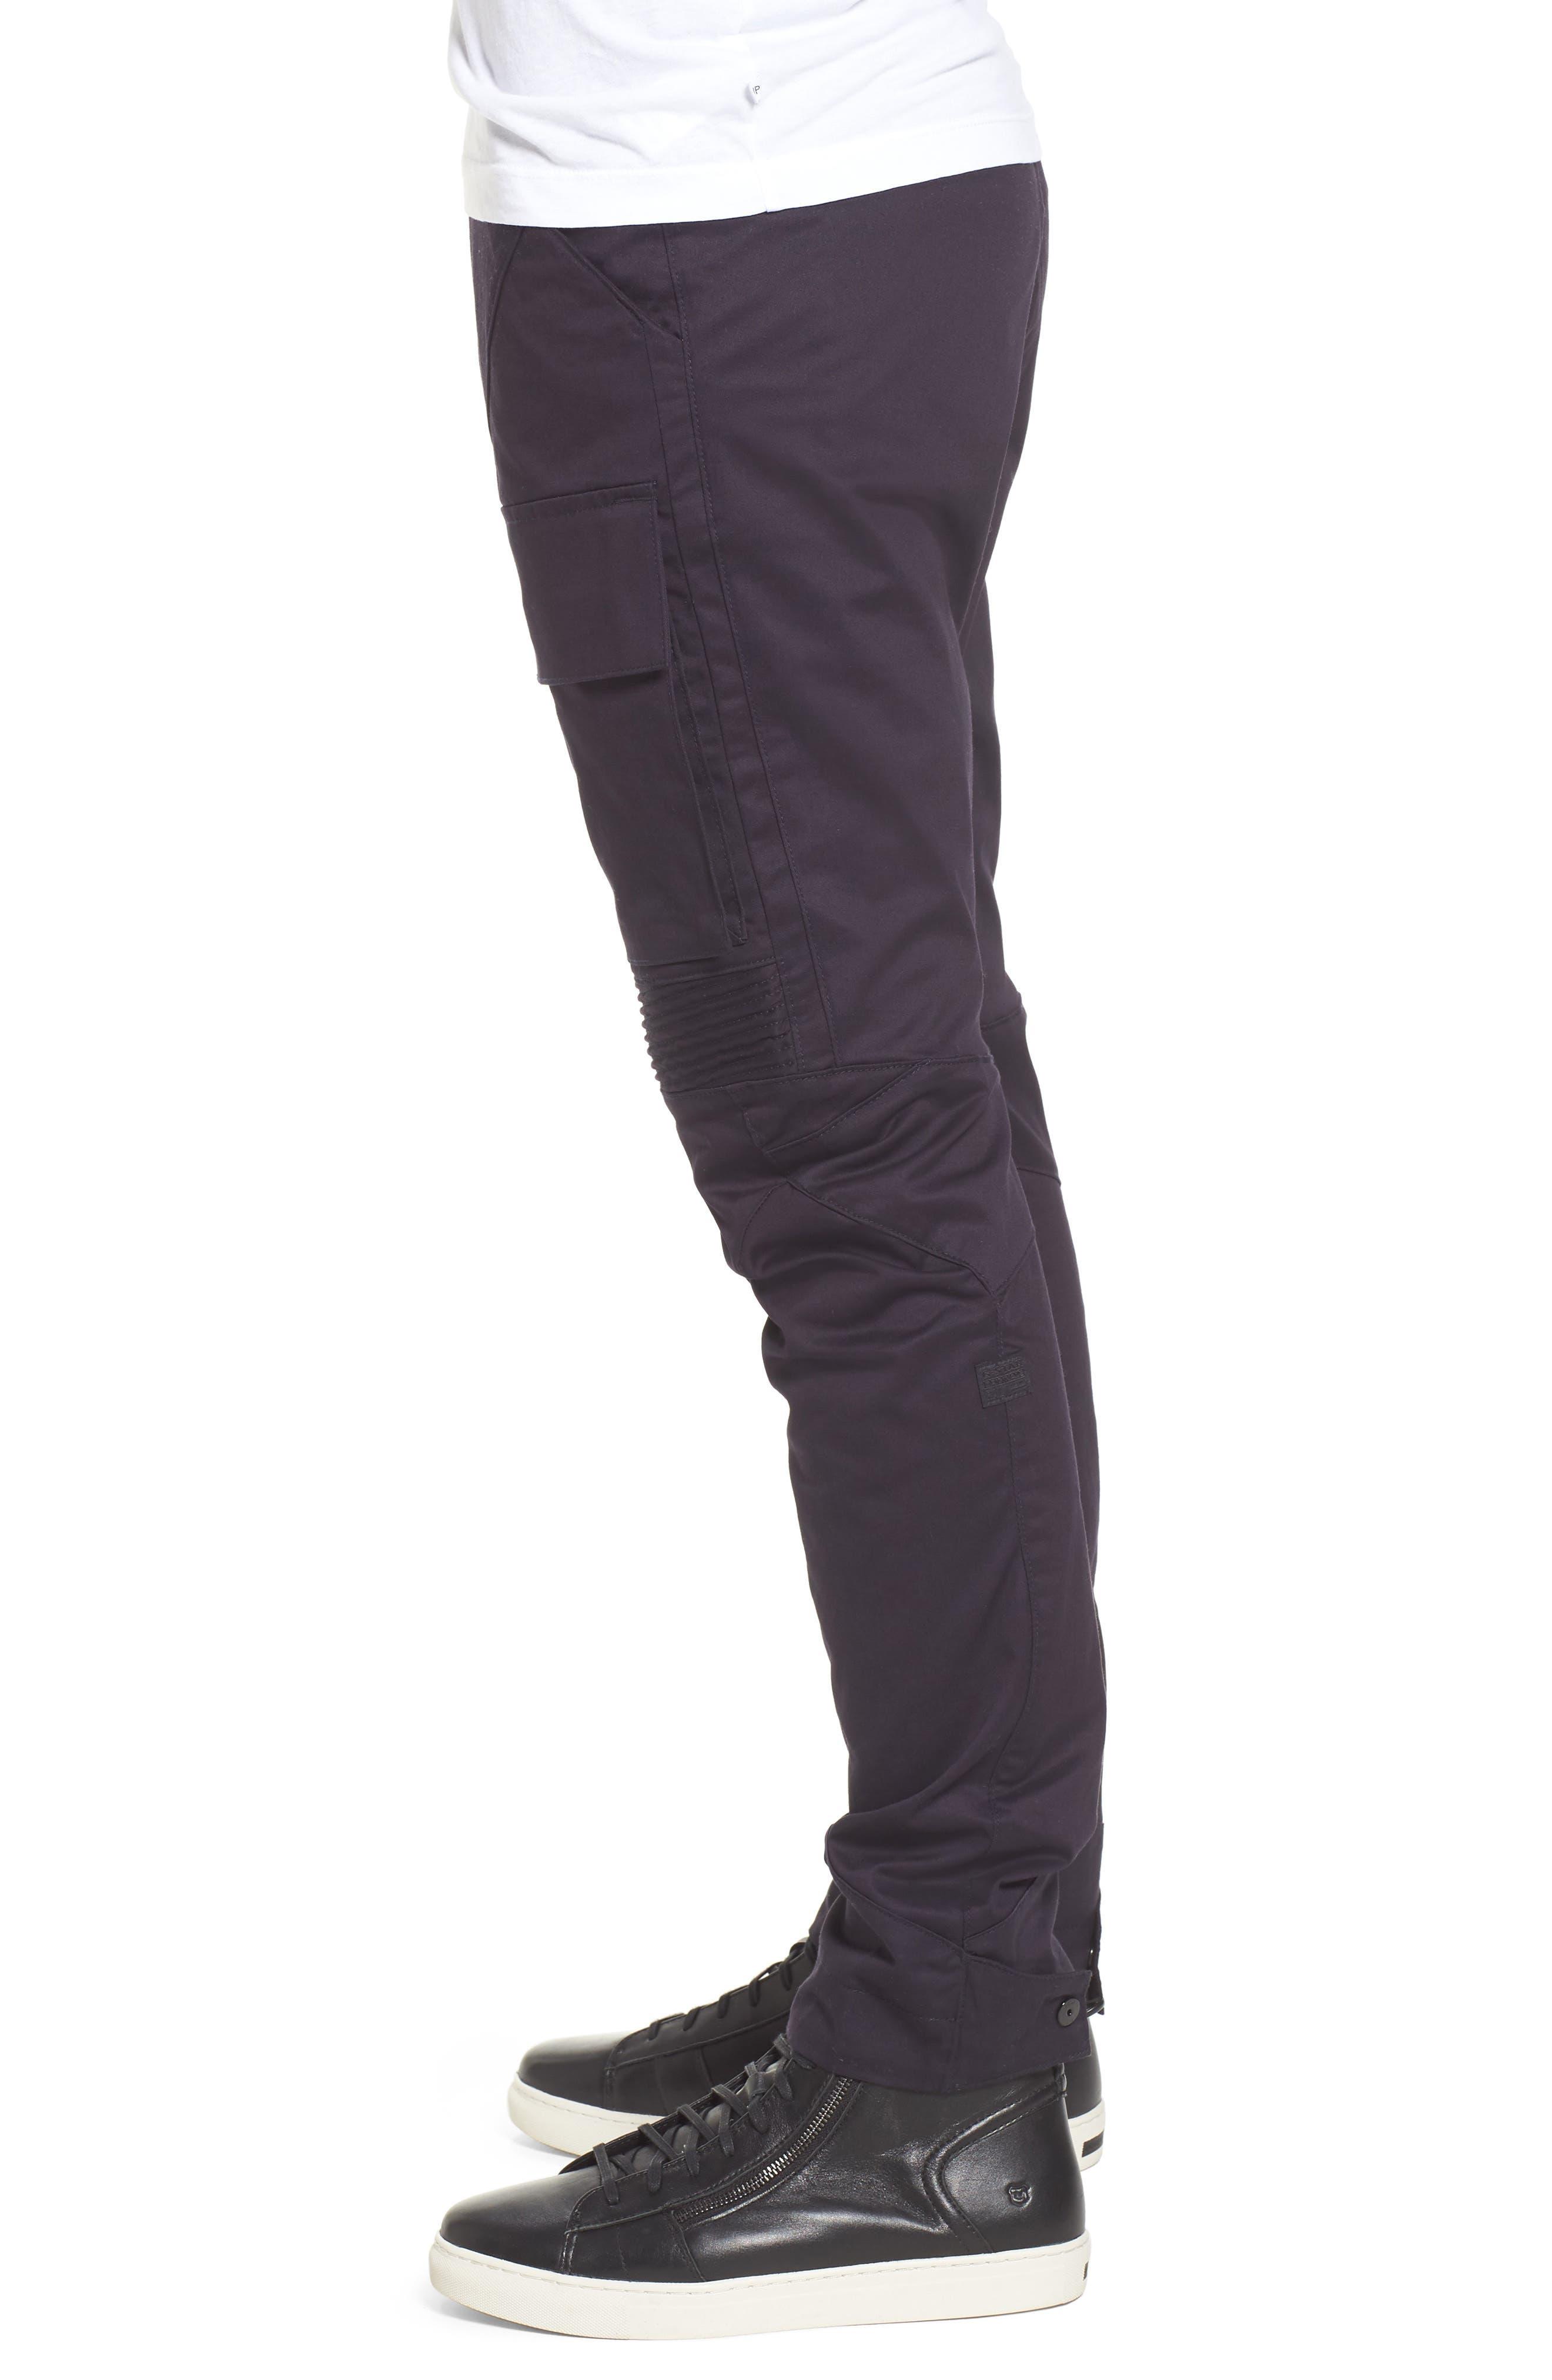 Vodan DC Slim Pants,                             Alternate thumbnail 3, color,                             Dark Naval Blue